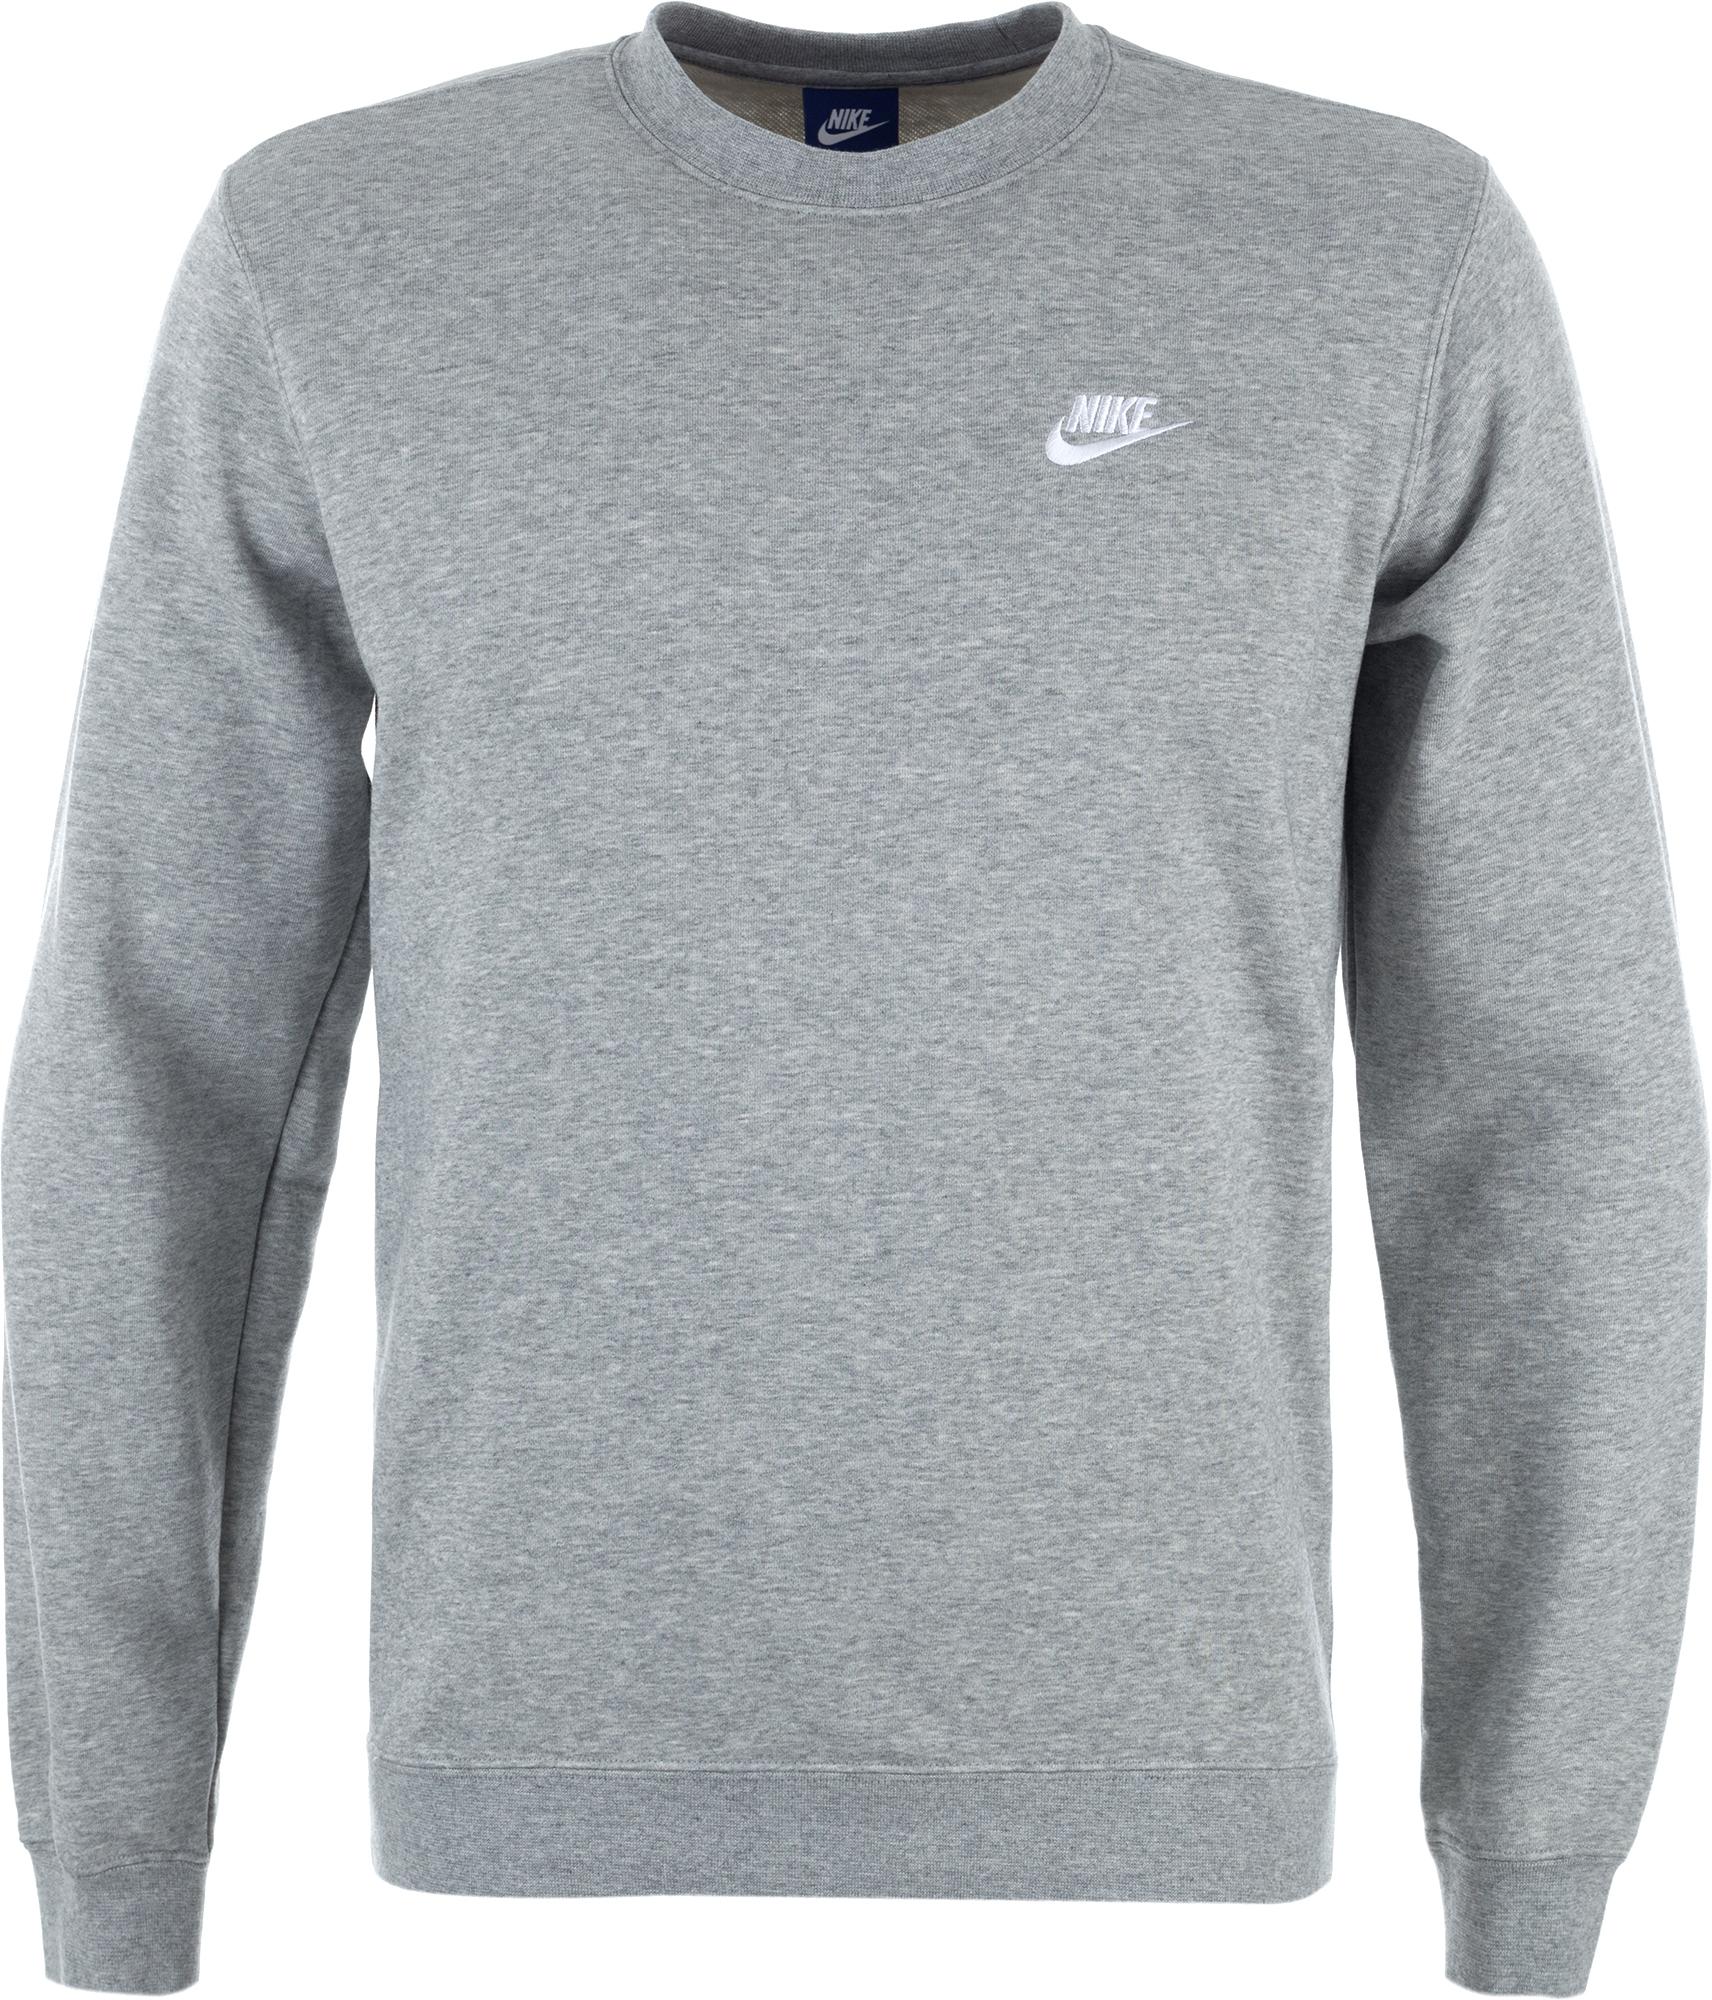 Nike Джемпер мужской Nike Sportswear